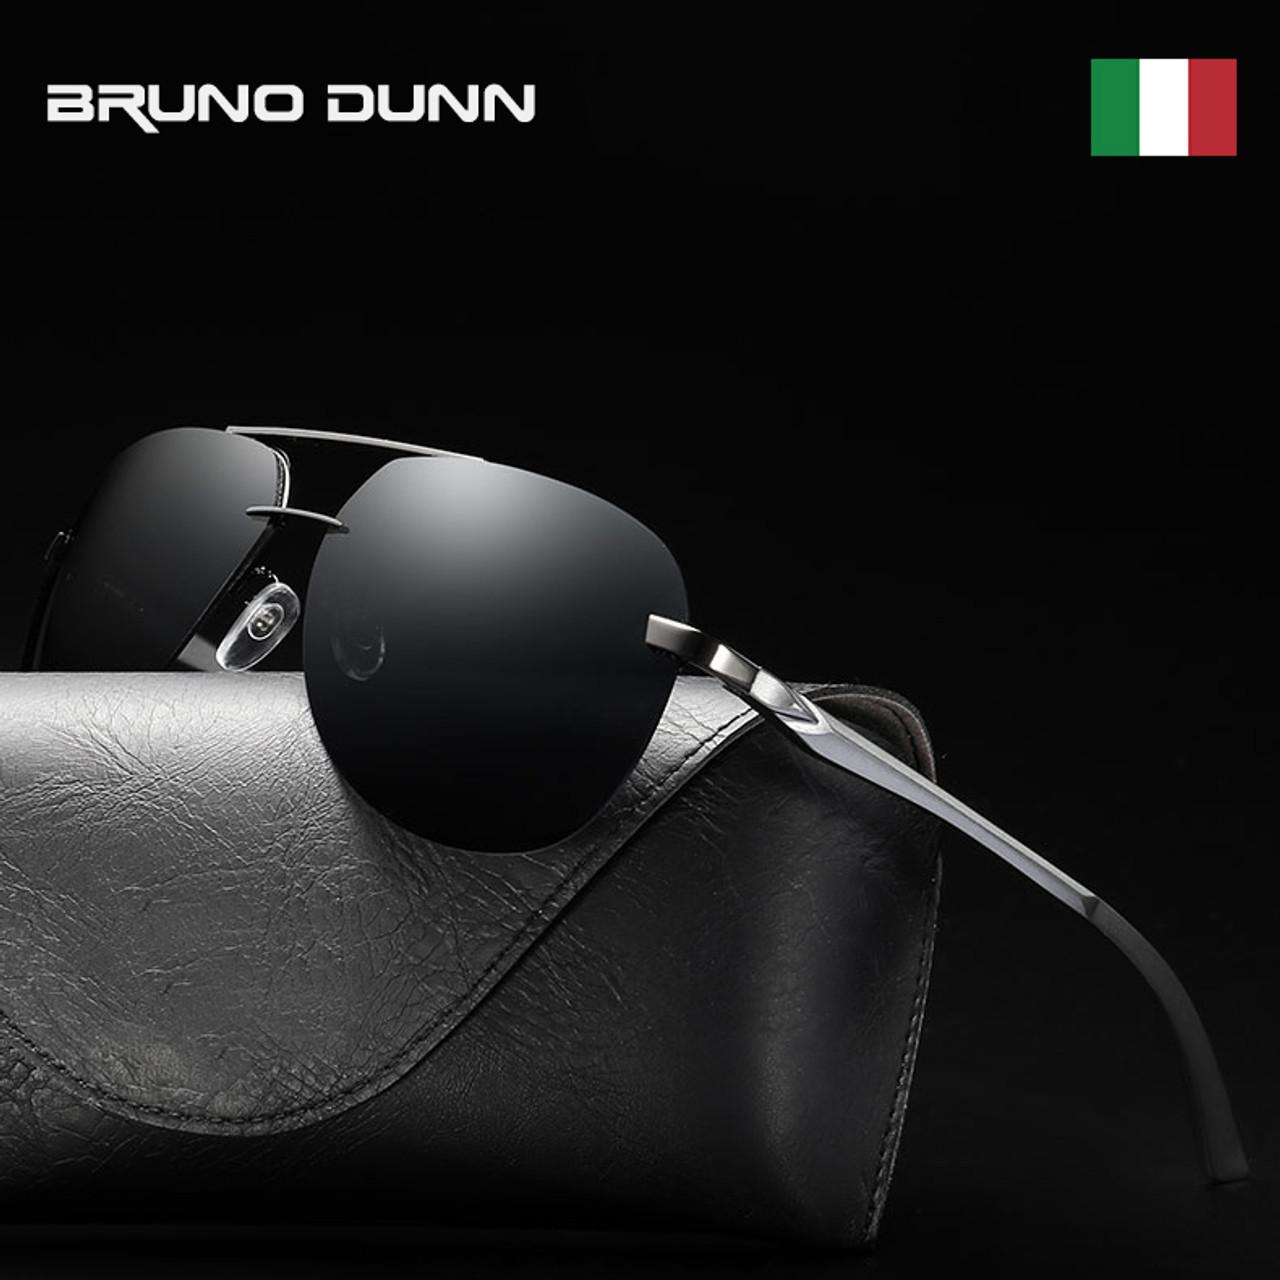 76b540a9fb Aviator Sunglasses Men Women Polarized 2018 Luxury Brand Designer Oculos  Aviador Gafas Lentes Lunette sun glasses ...